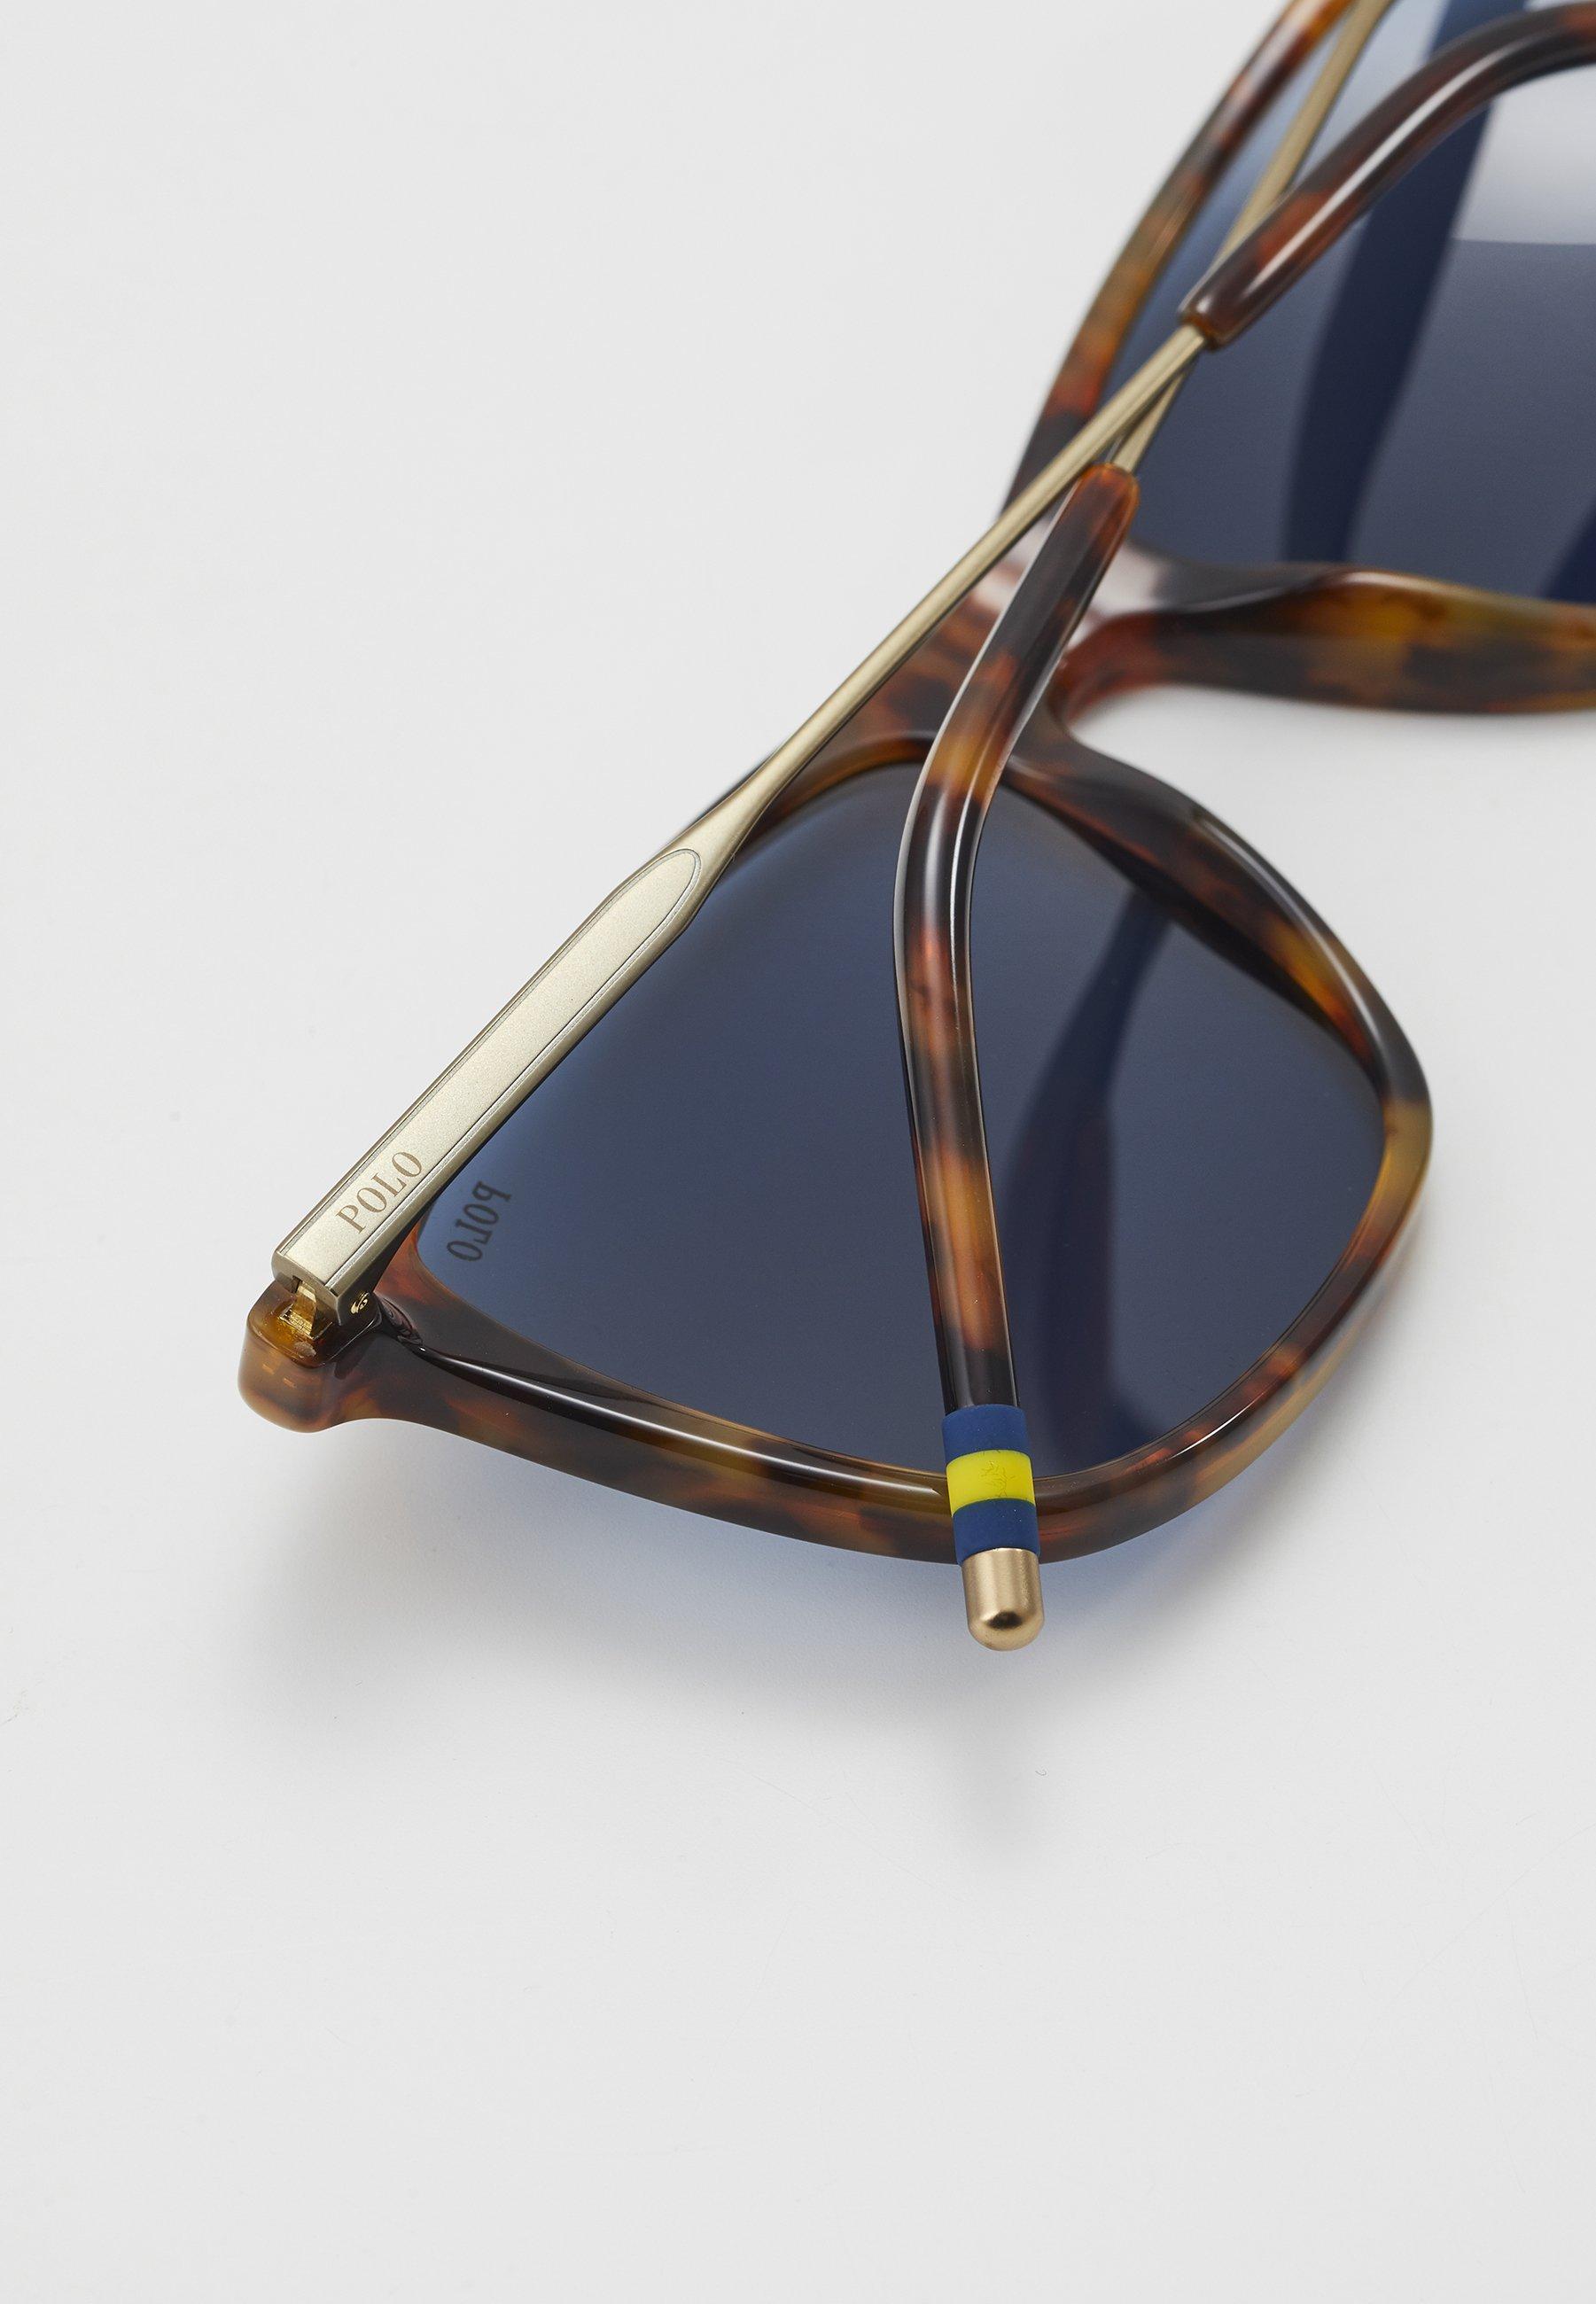 Compra Polo Ralph Lauren Gafas de sol - brown/blue   Complementos de hombre 2020 18W4M